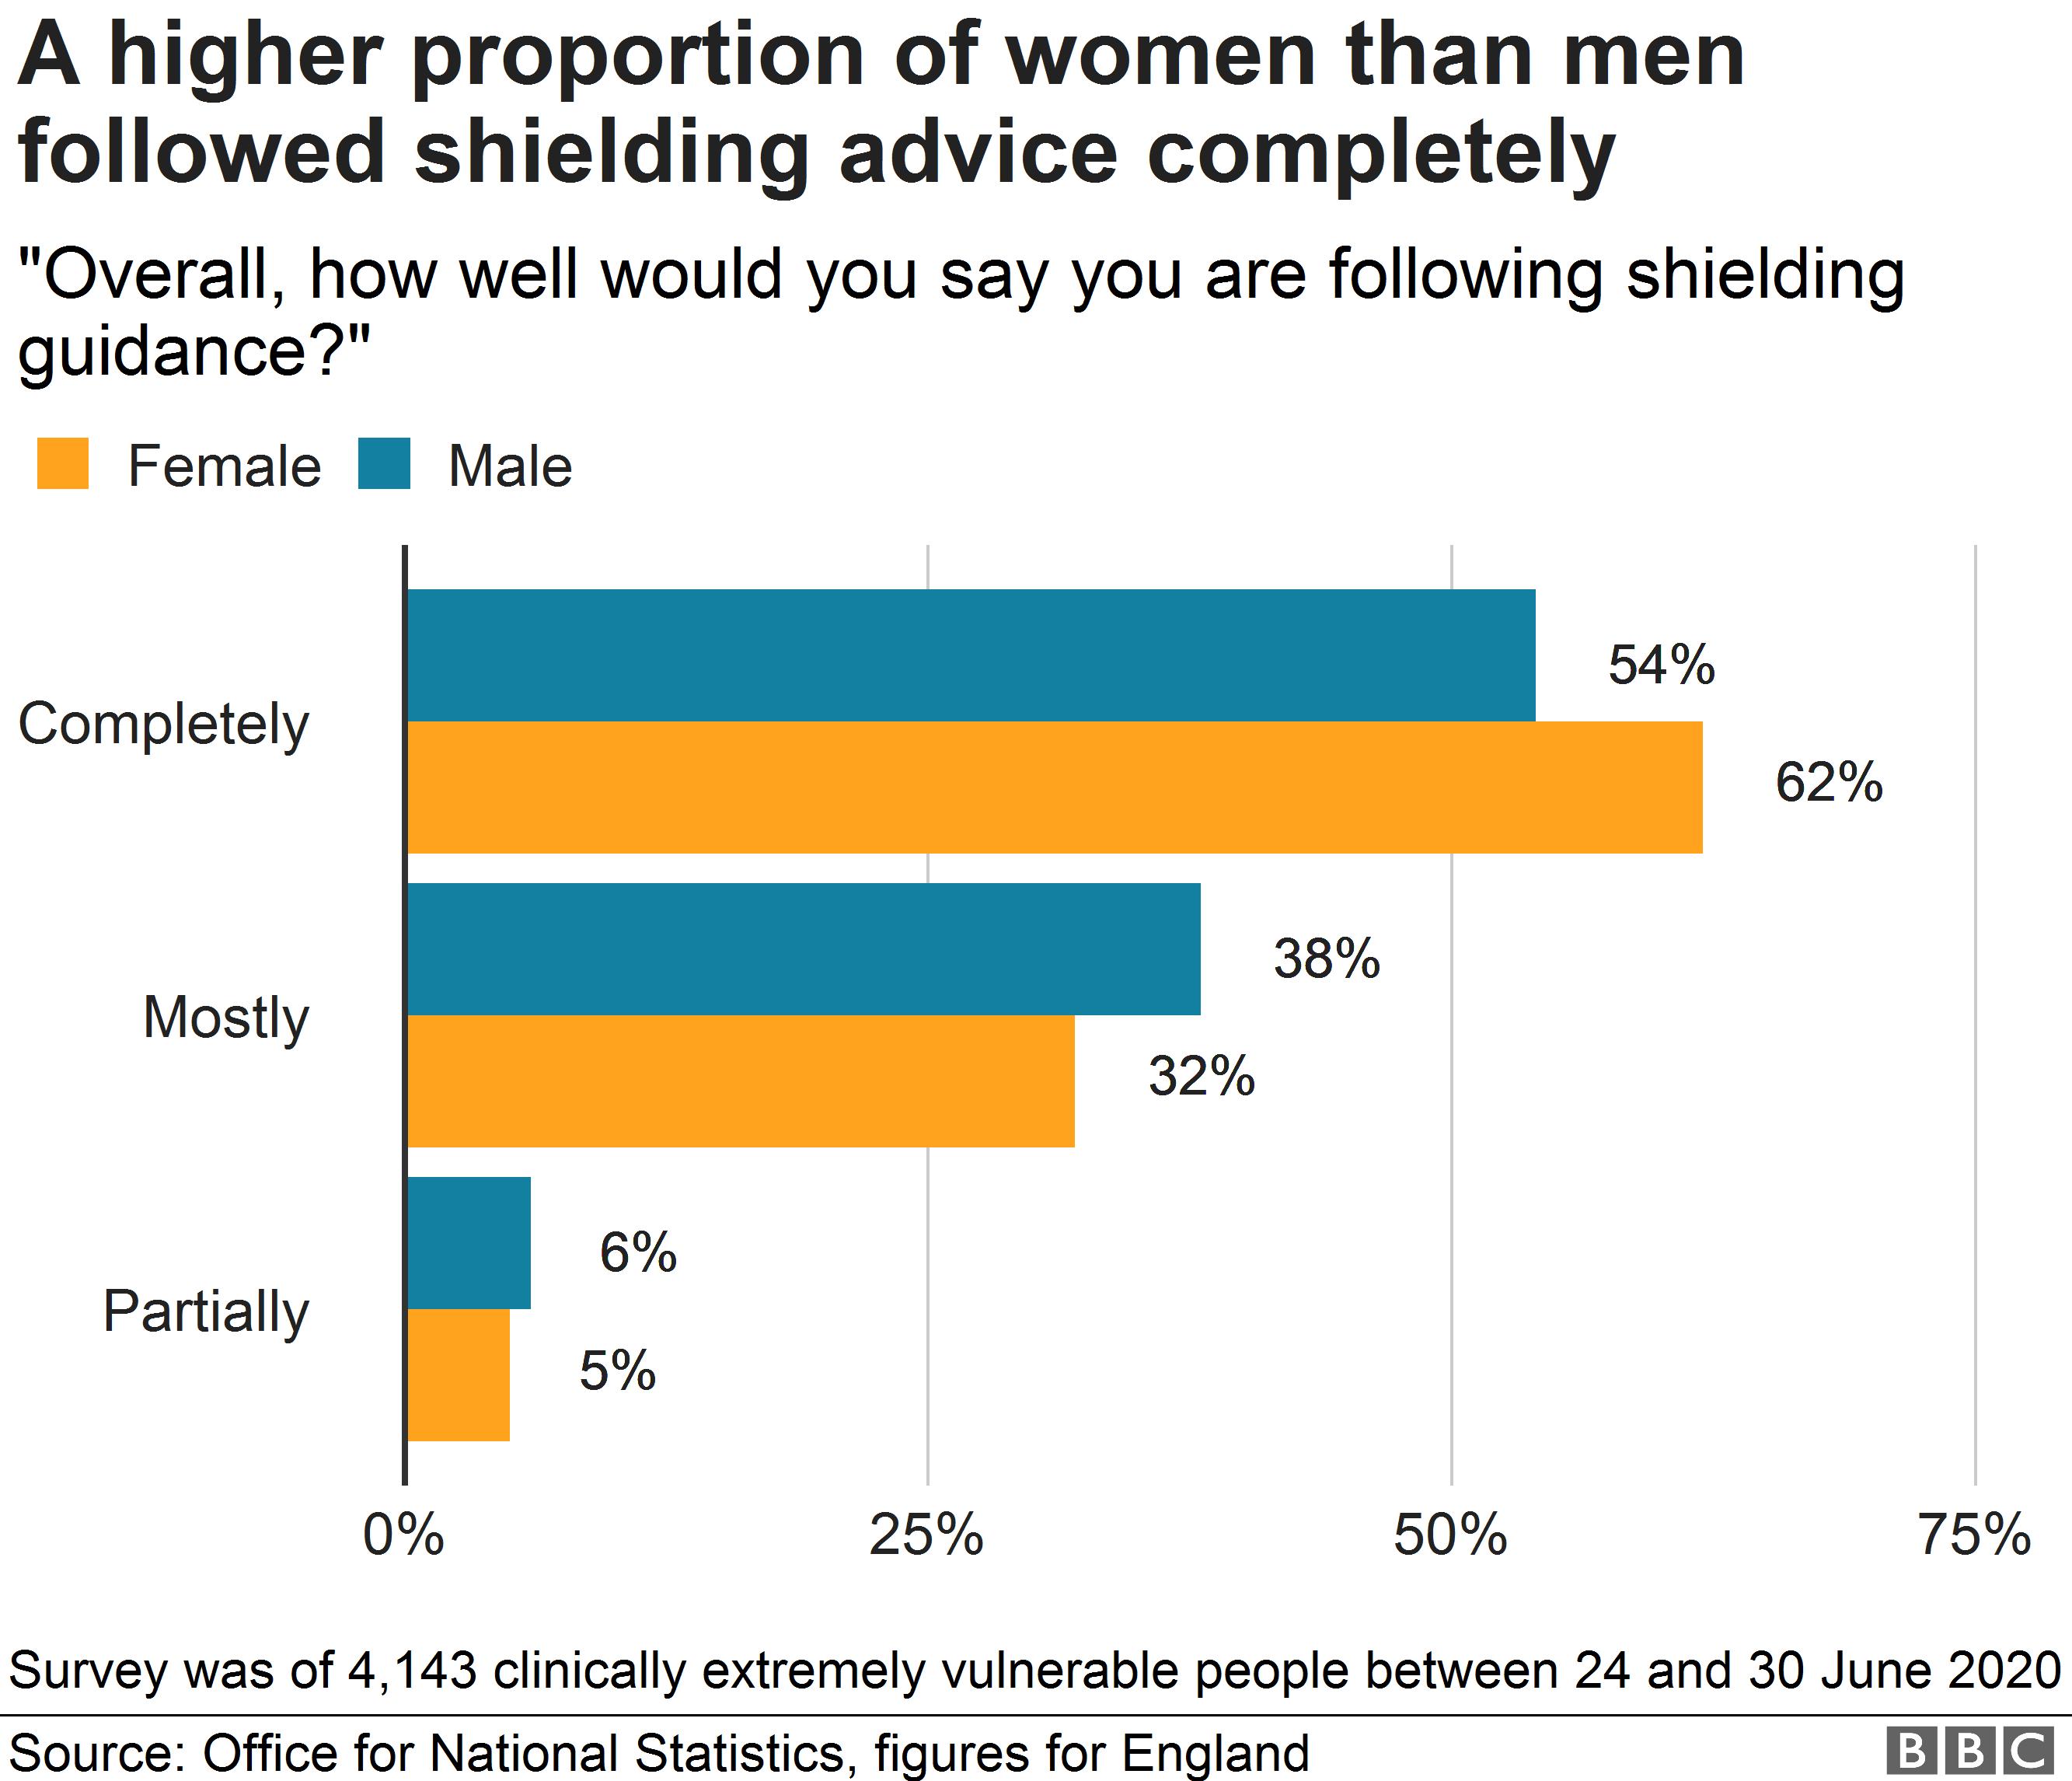 Shielding compliance by gender